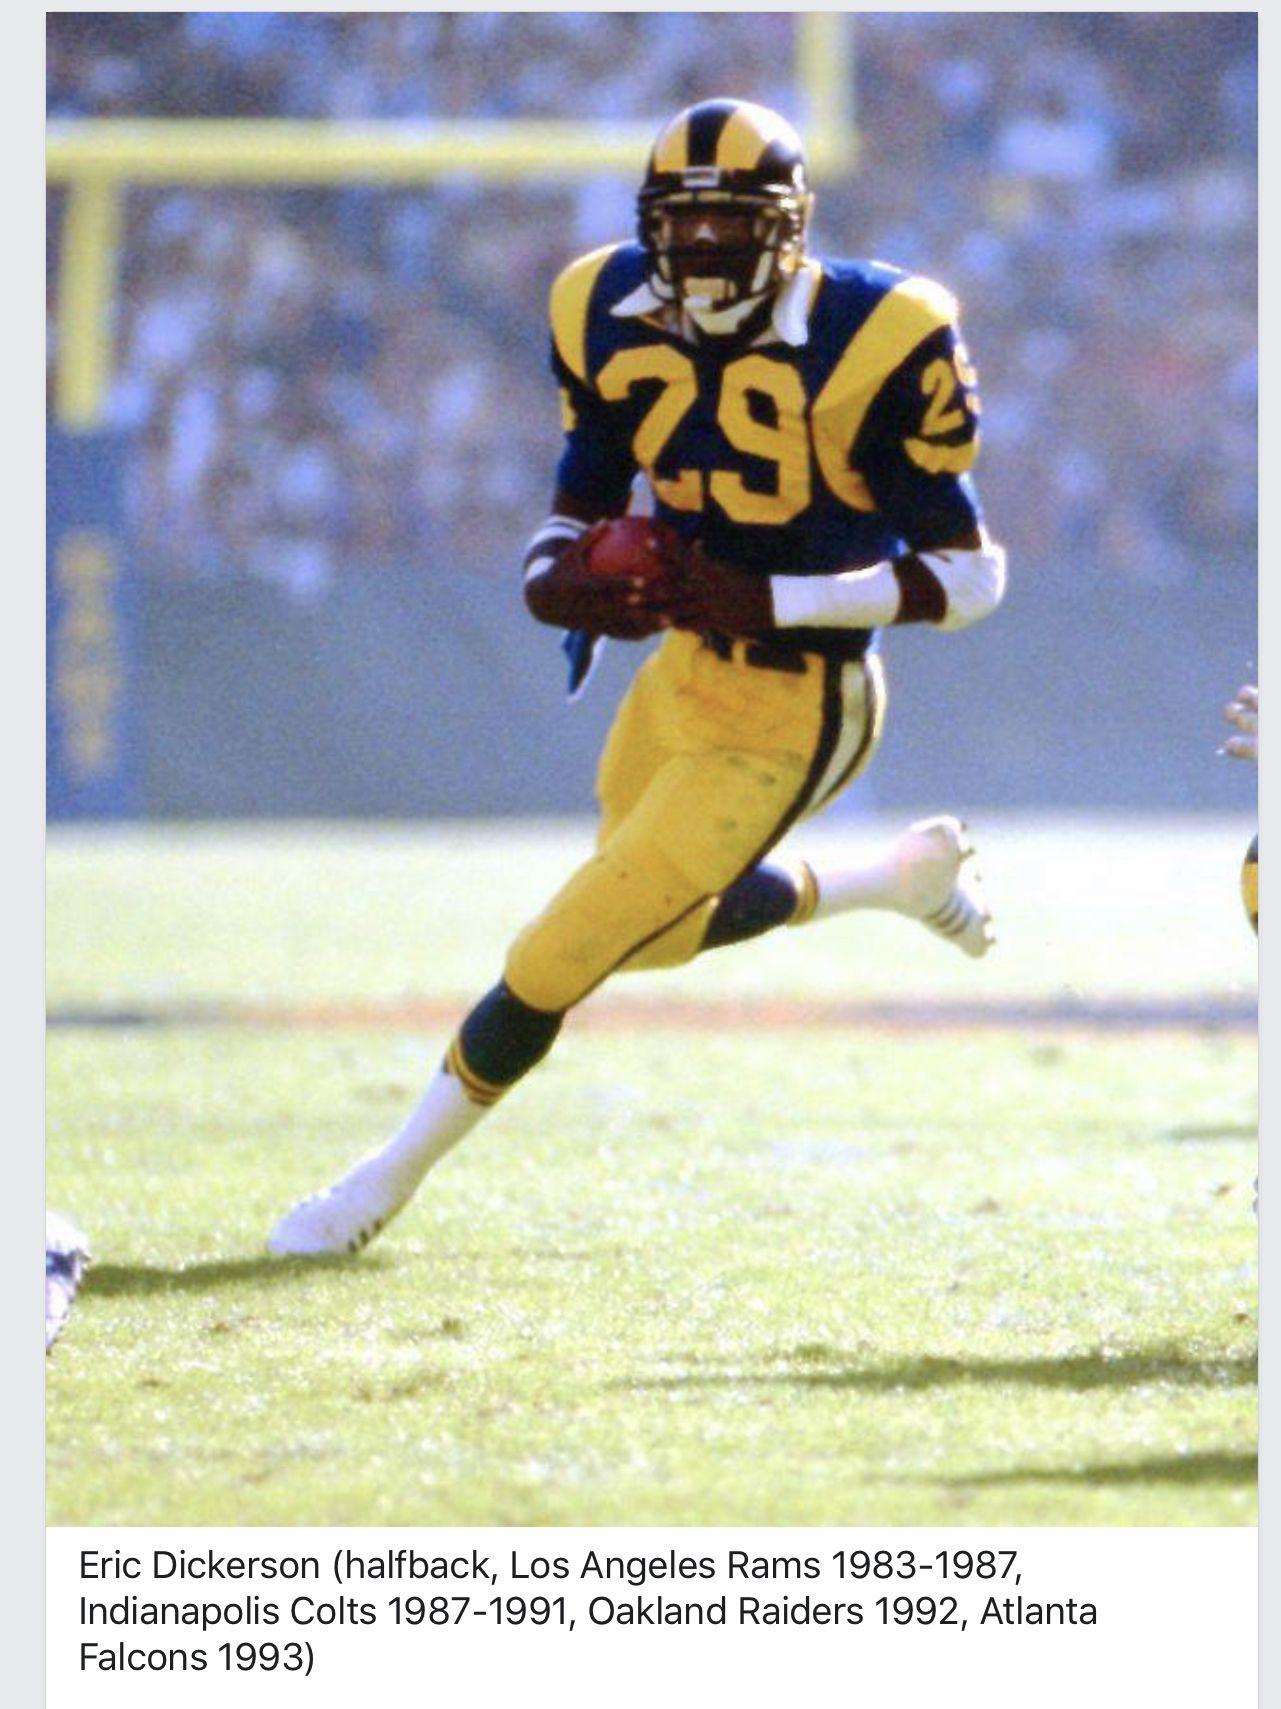 Pin By Artie Johnson On Vintage La Rams Eric Dickerson Los Angeles Rams American Football League